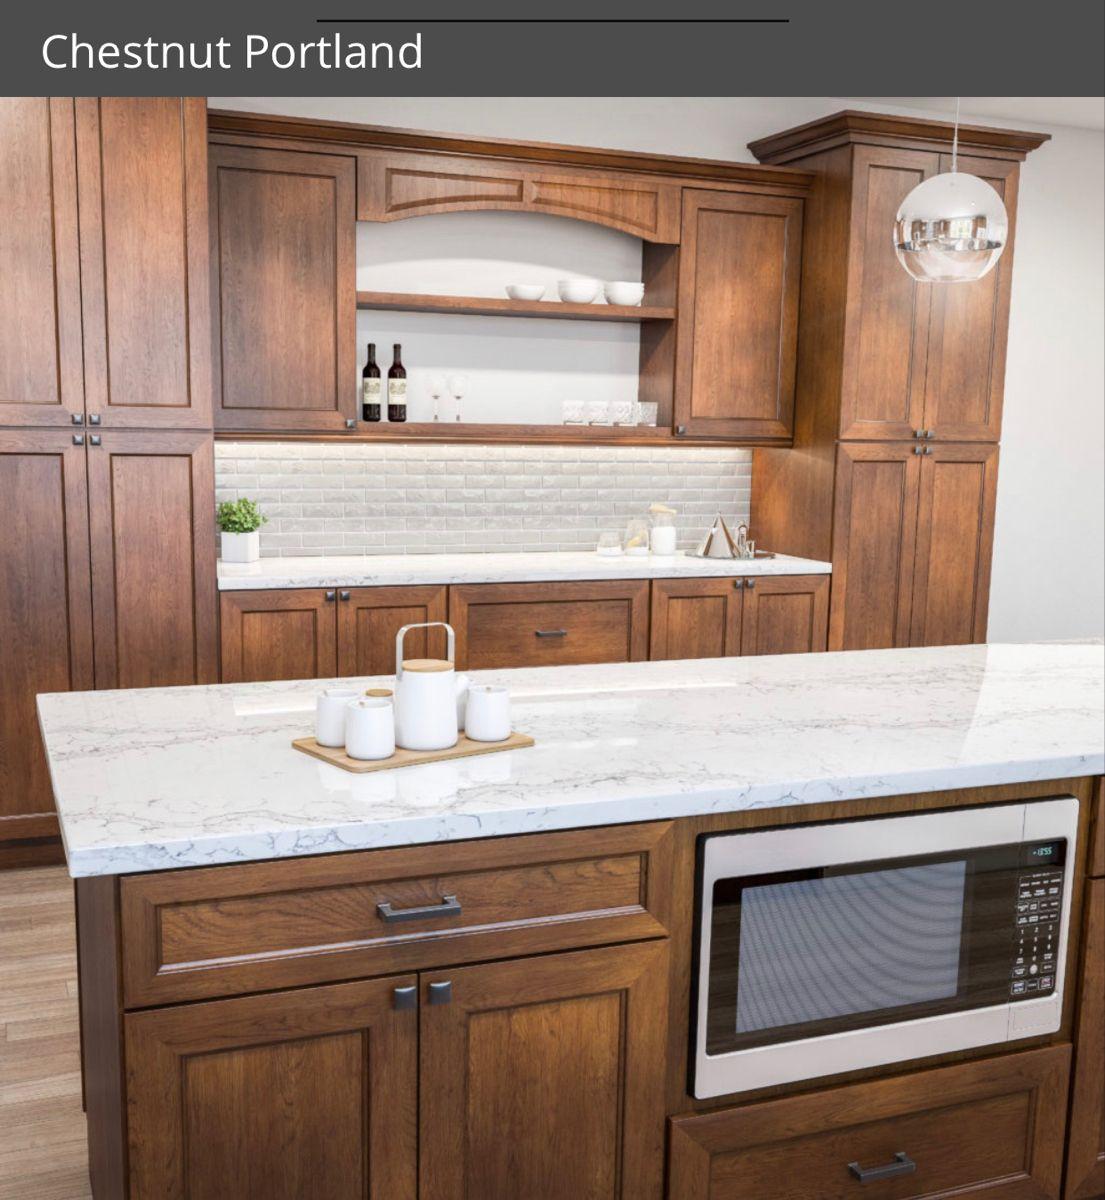 Kitchen Cabinet Door Styles Wood Cabinets Nashville Tn In 2020 Cabinet Door Styles Kitchen Cabinet Door Styles Kitchen Cabinet Doors